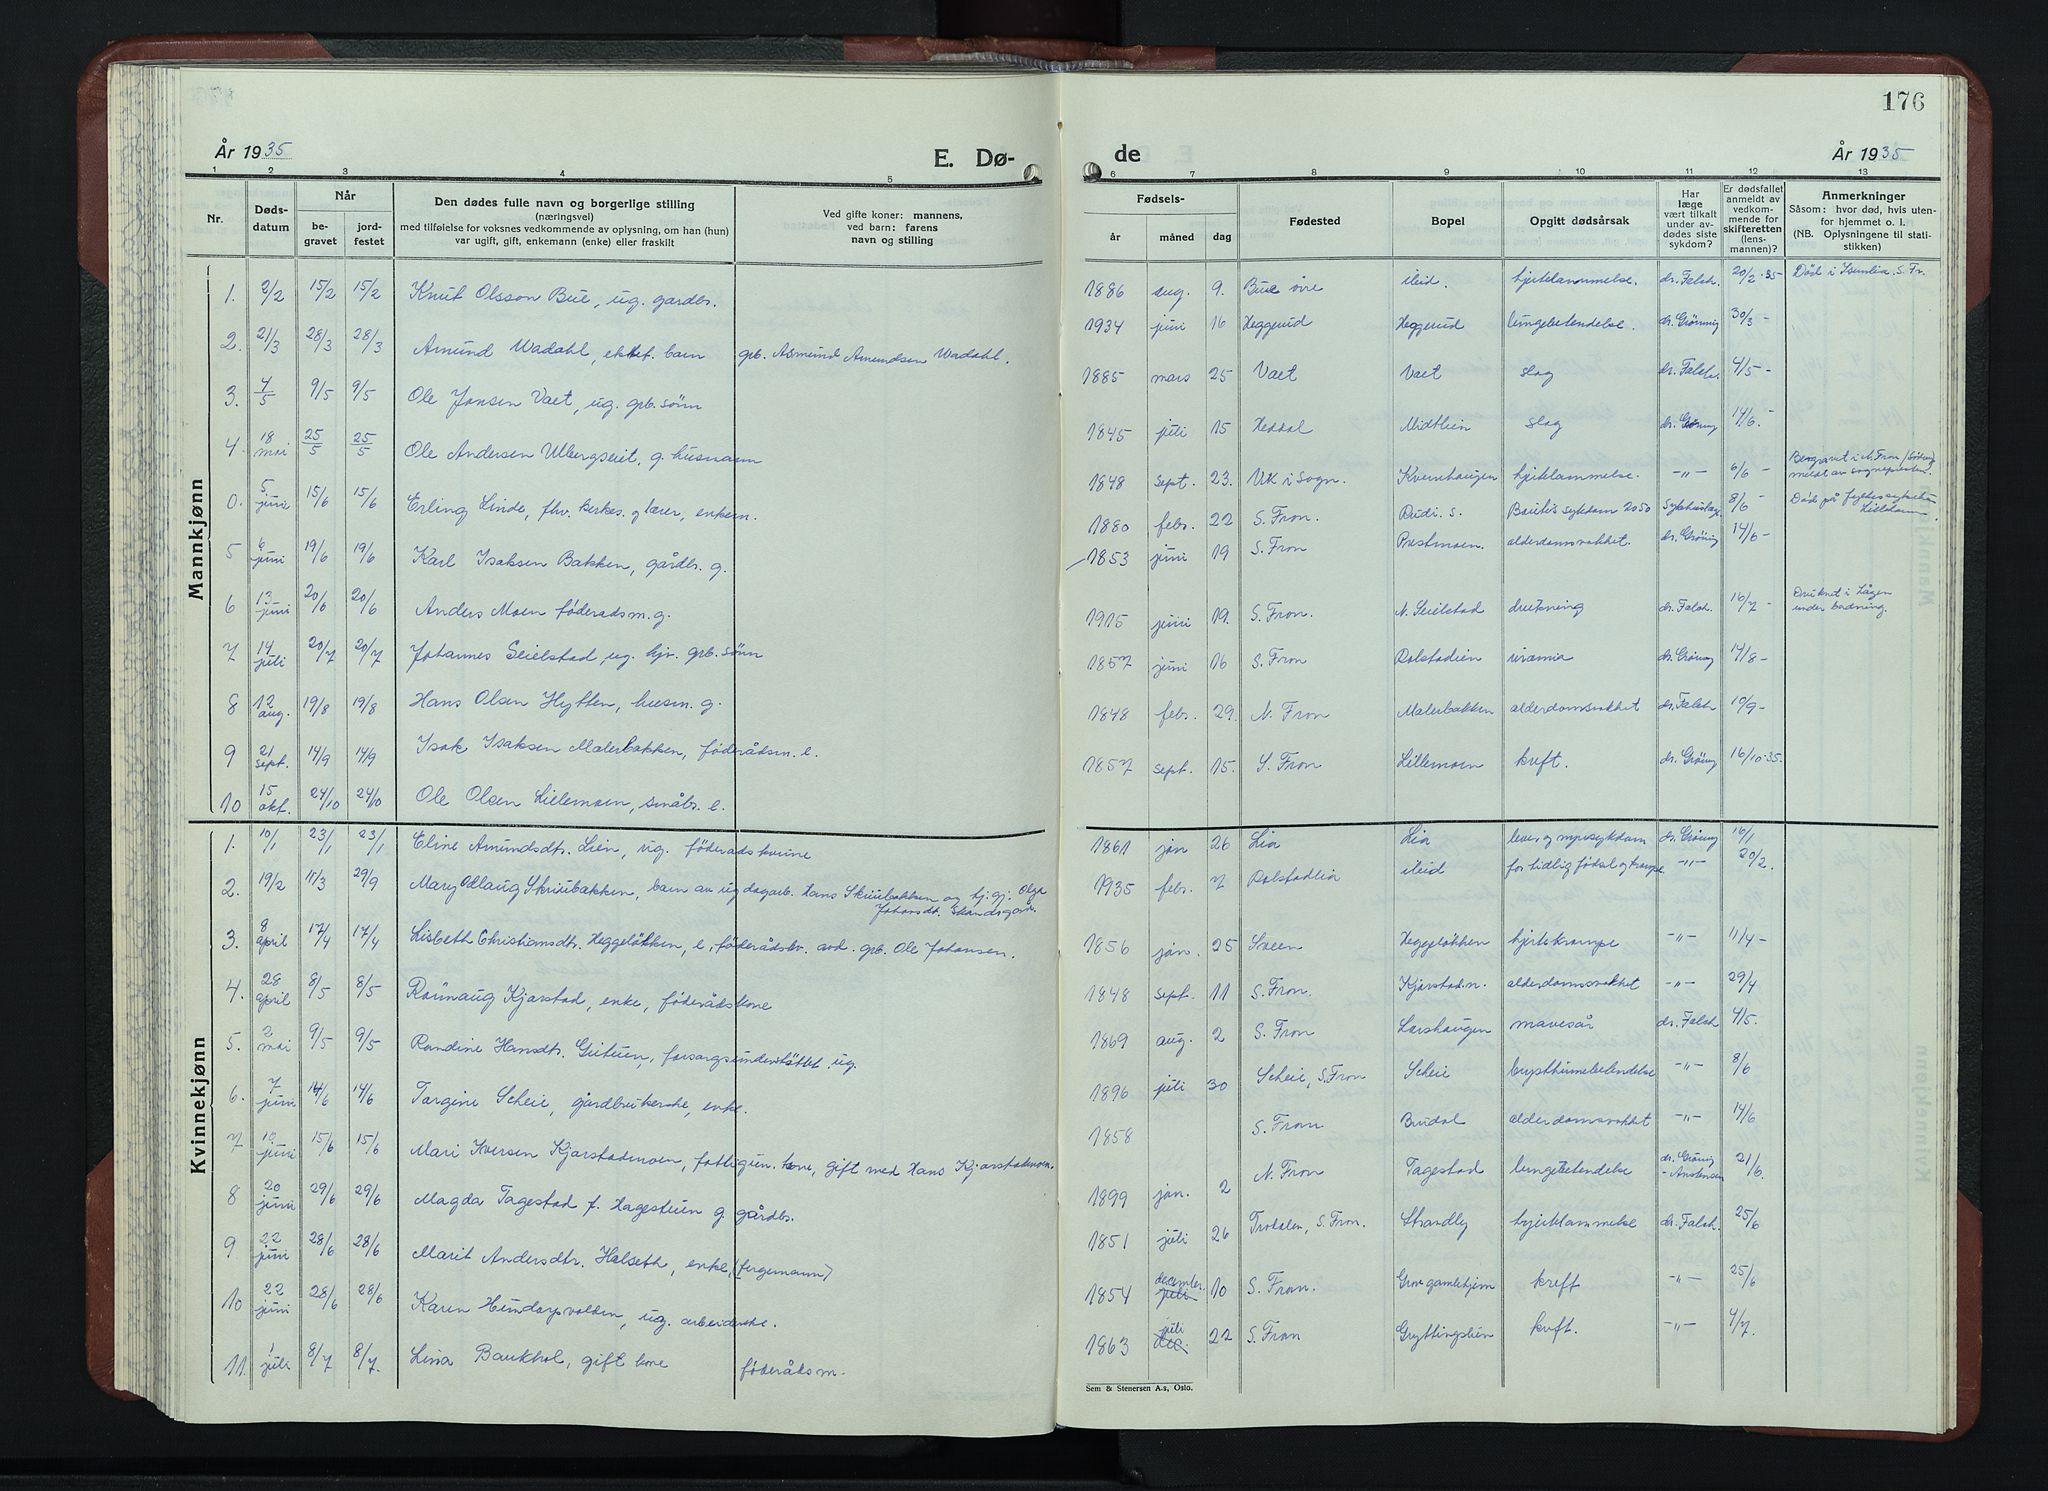 SAH, Sør-Fron prestekontor, H/Ha/Hab/L0006: Klokkerbok nr. 6, 1933-1948, s. 176